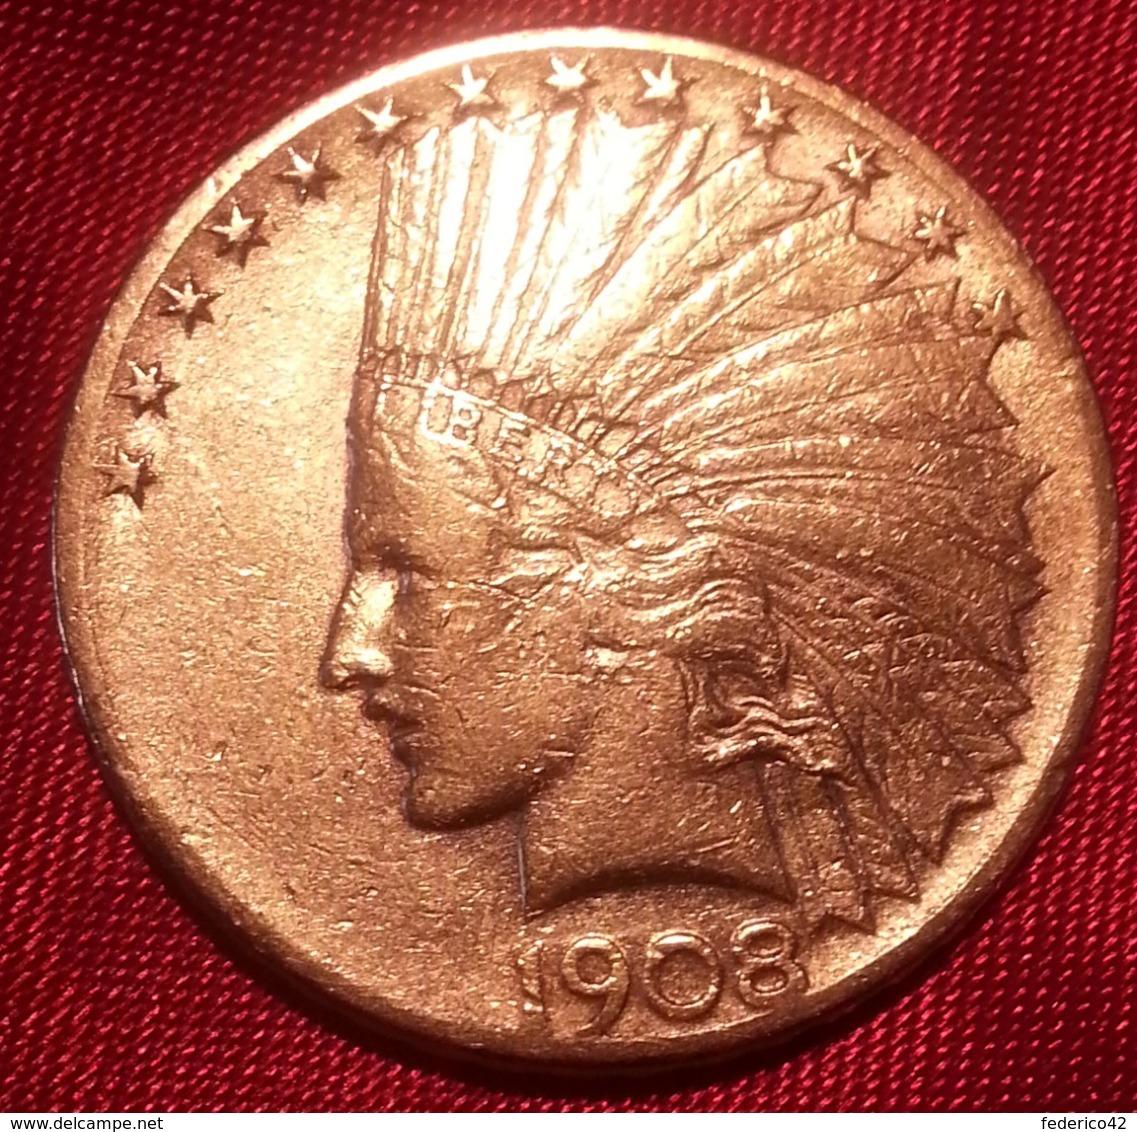 "RARISSIMA MONETA ORO 10 DOLLARI INDIANO 1908 ZECCA ""S"" SPL STATI UNITI AMERICA - L. Gold"